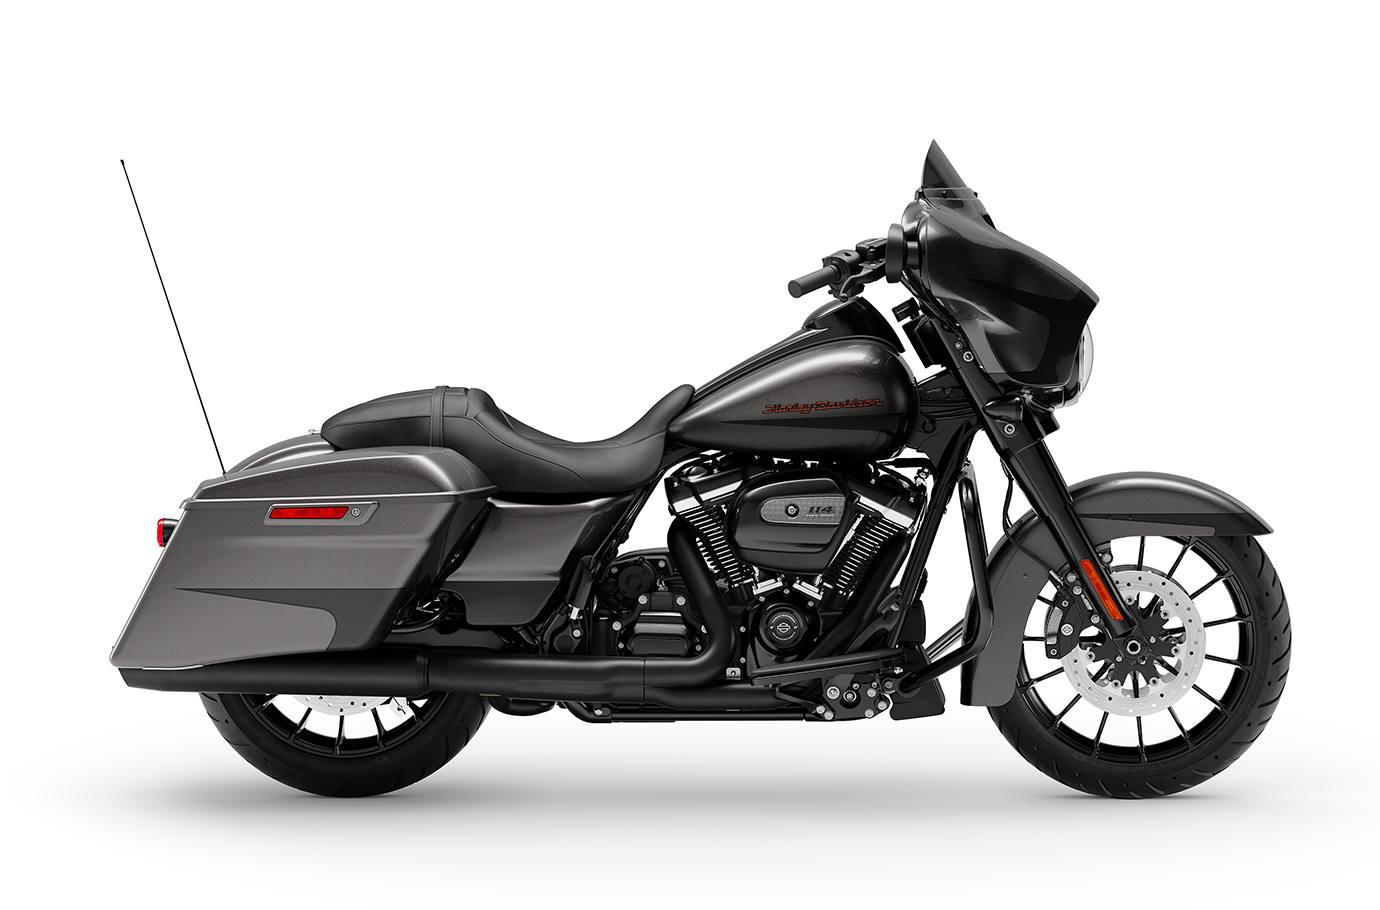 2019 Harley-Davidson® Street Glide® Special - Two-Tone Custom Option